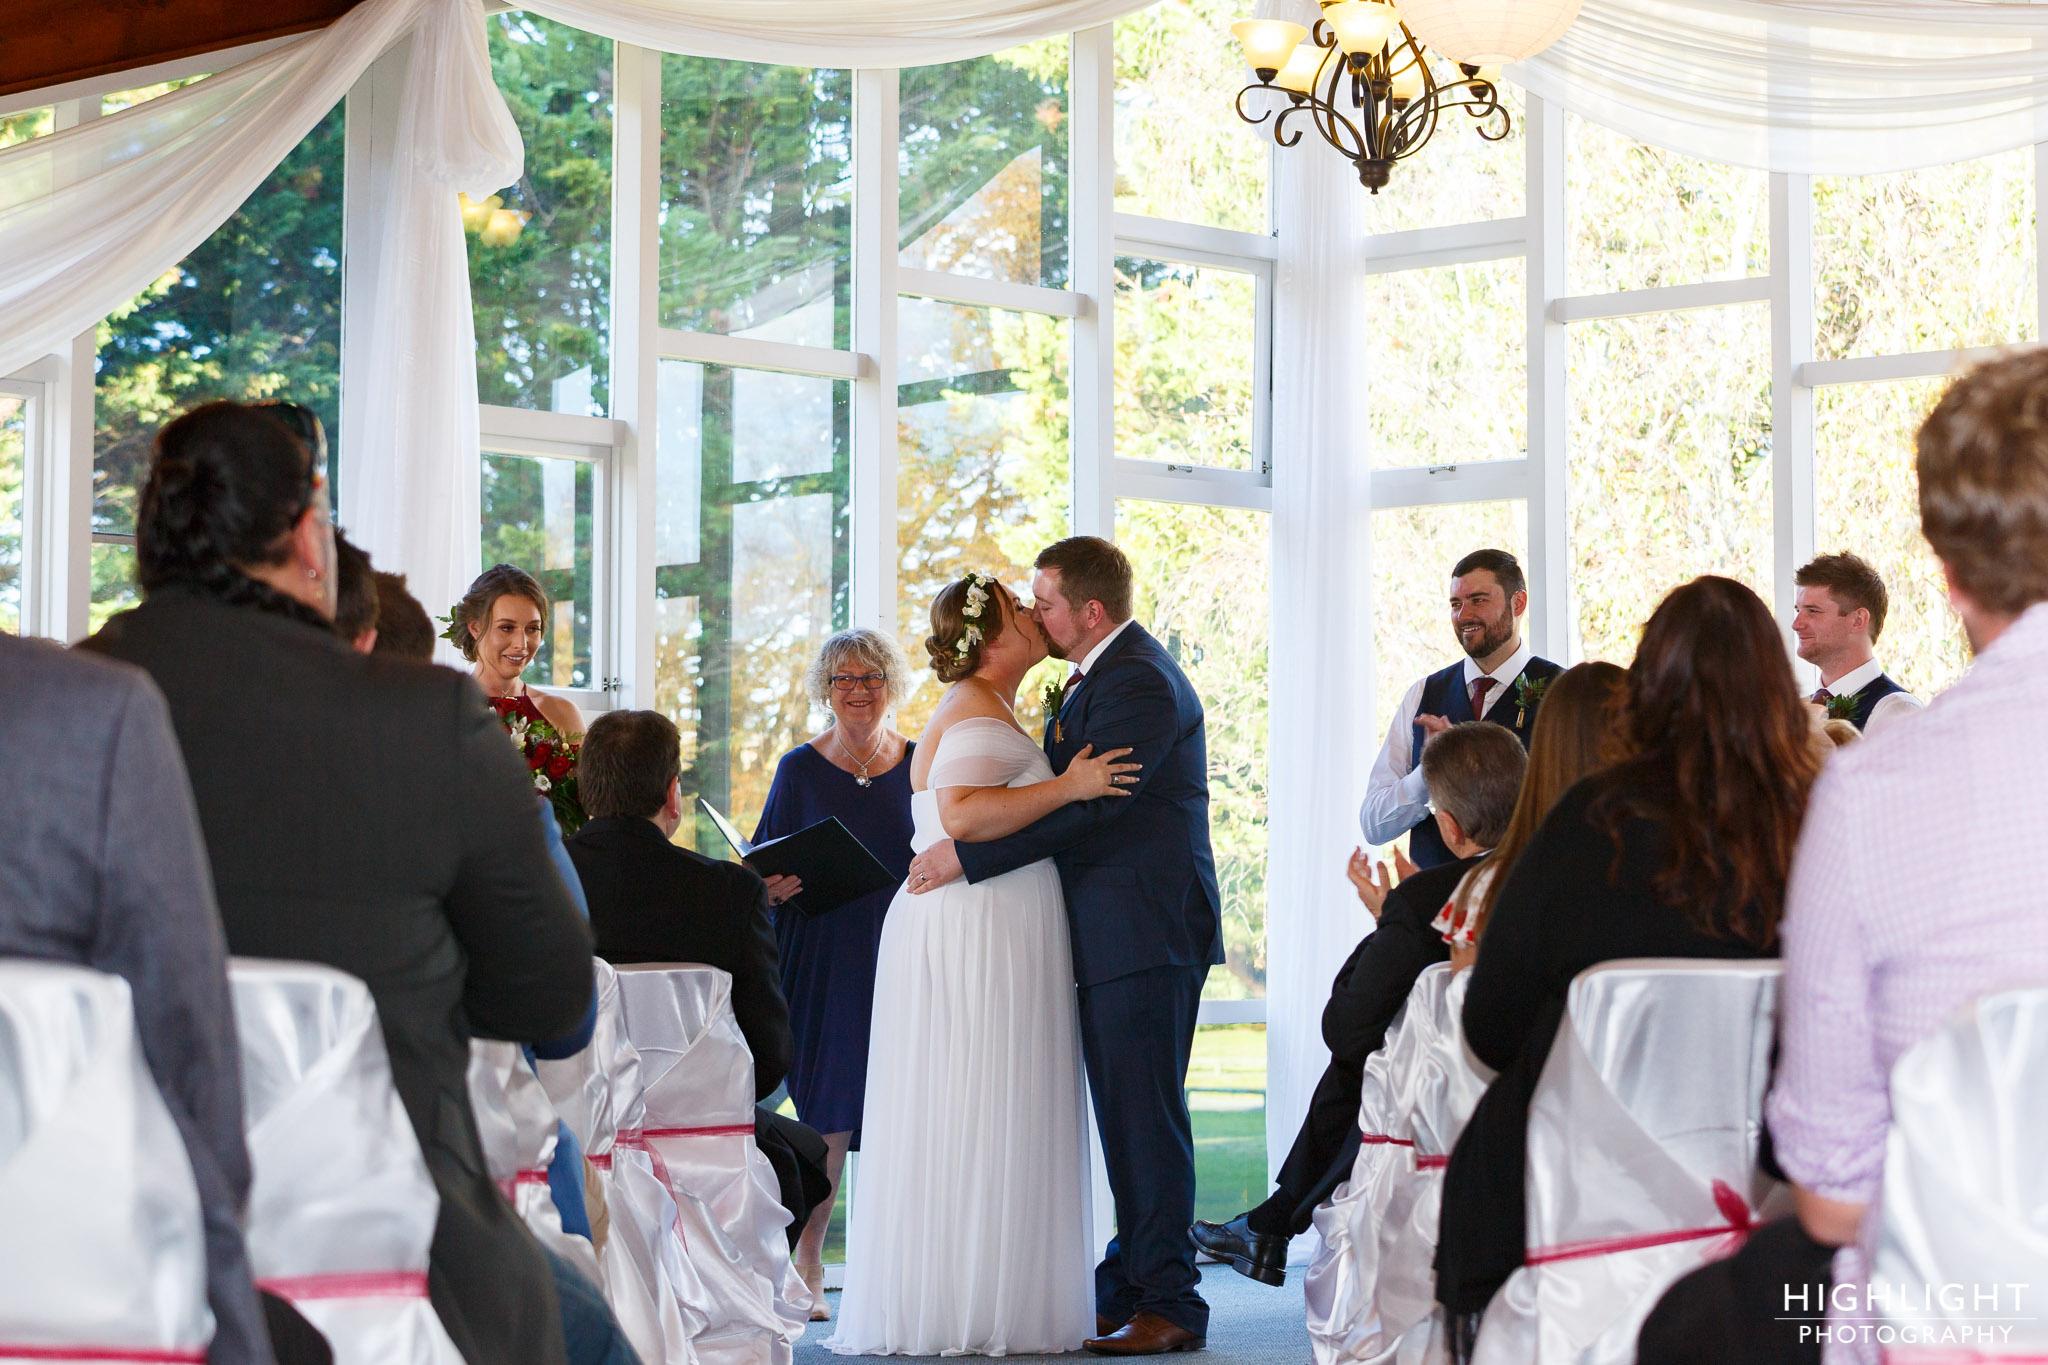 Highlight-wedding-photography-new-zealand-palmerston-north-57.jpg